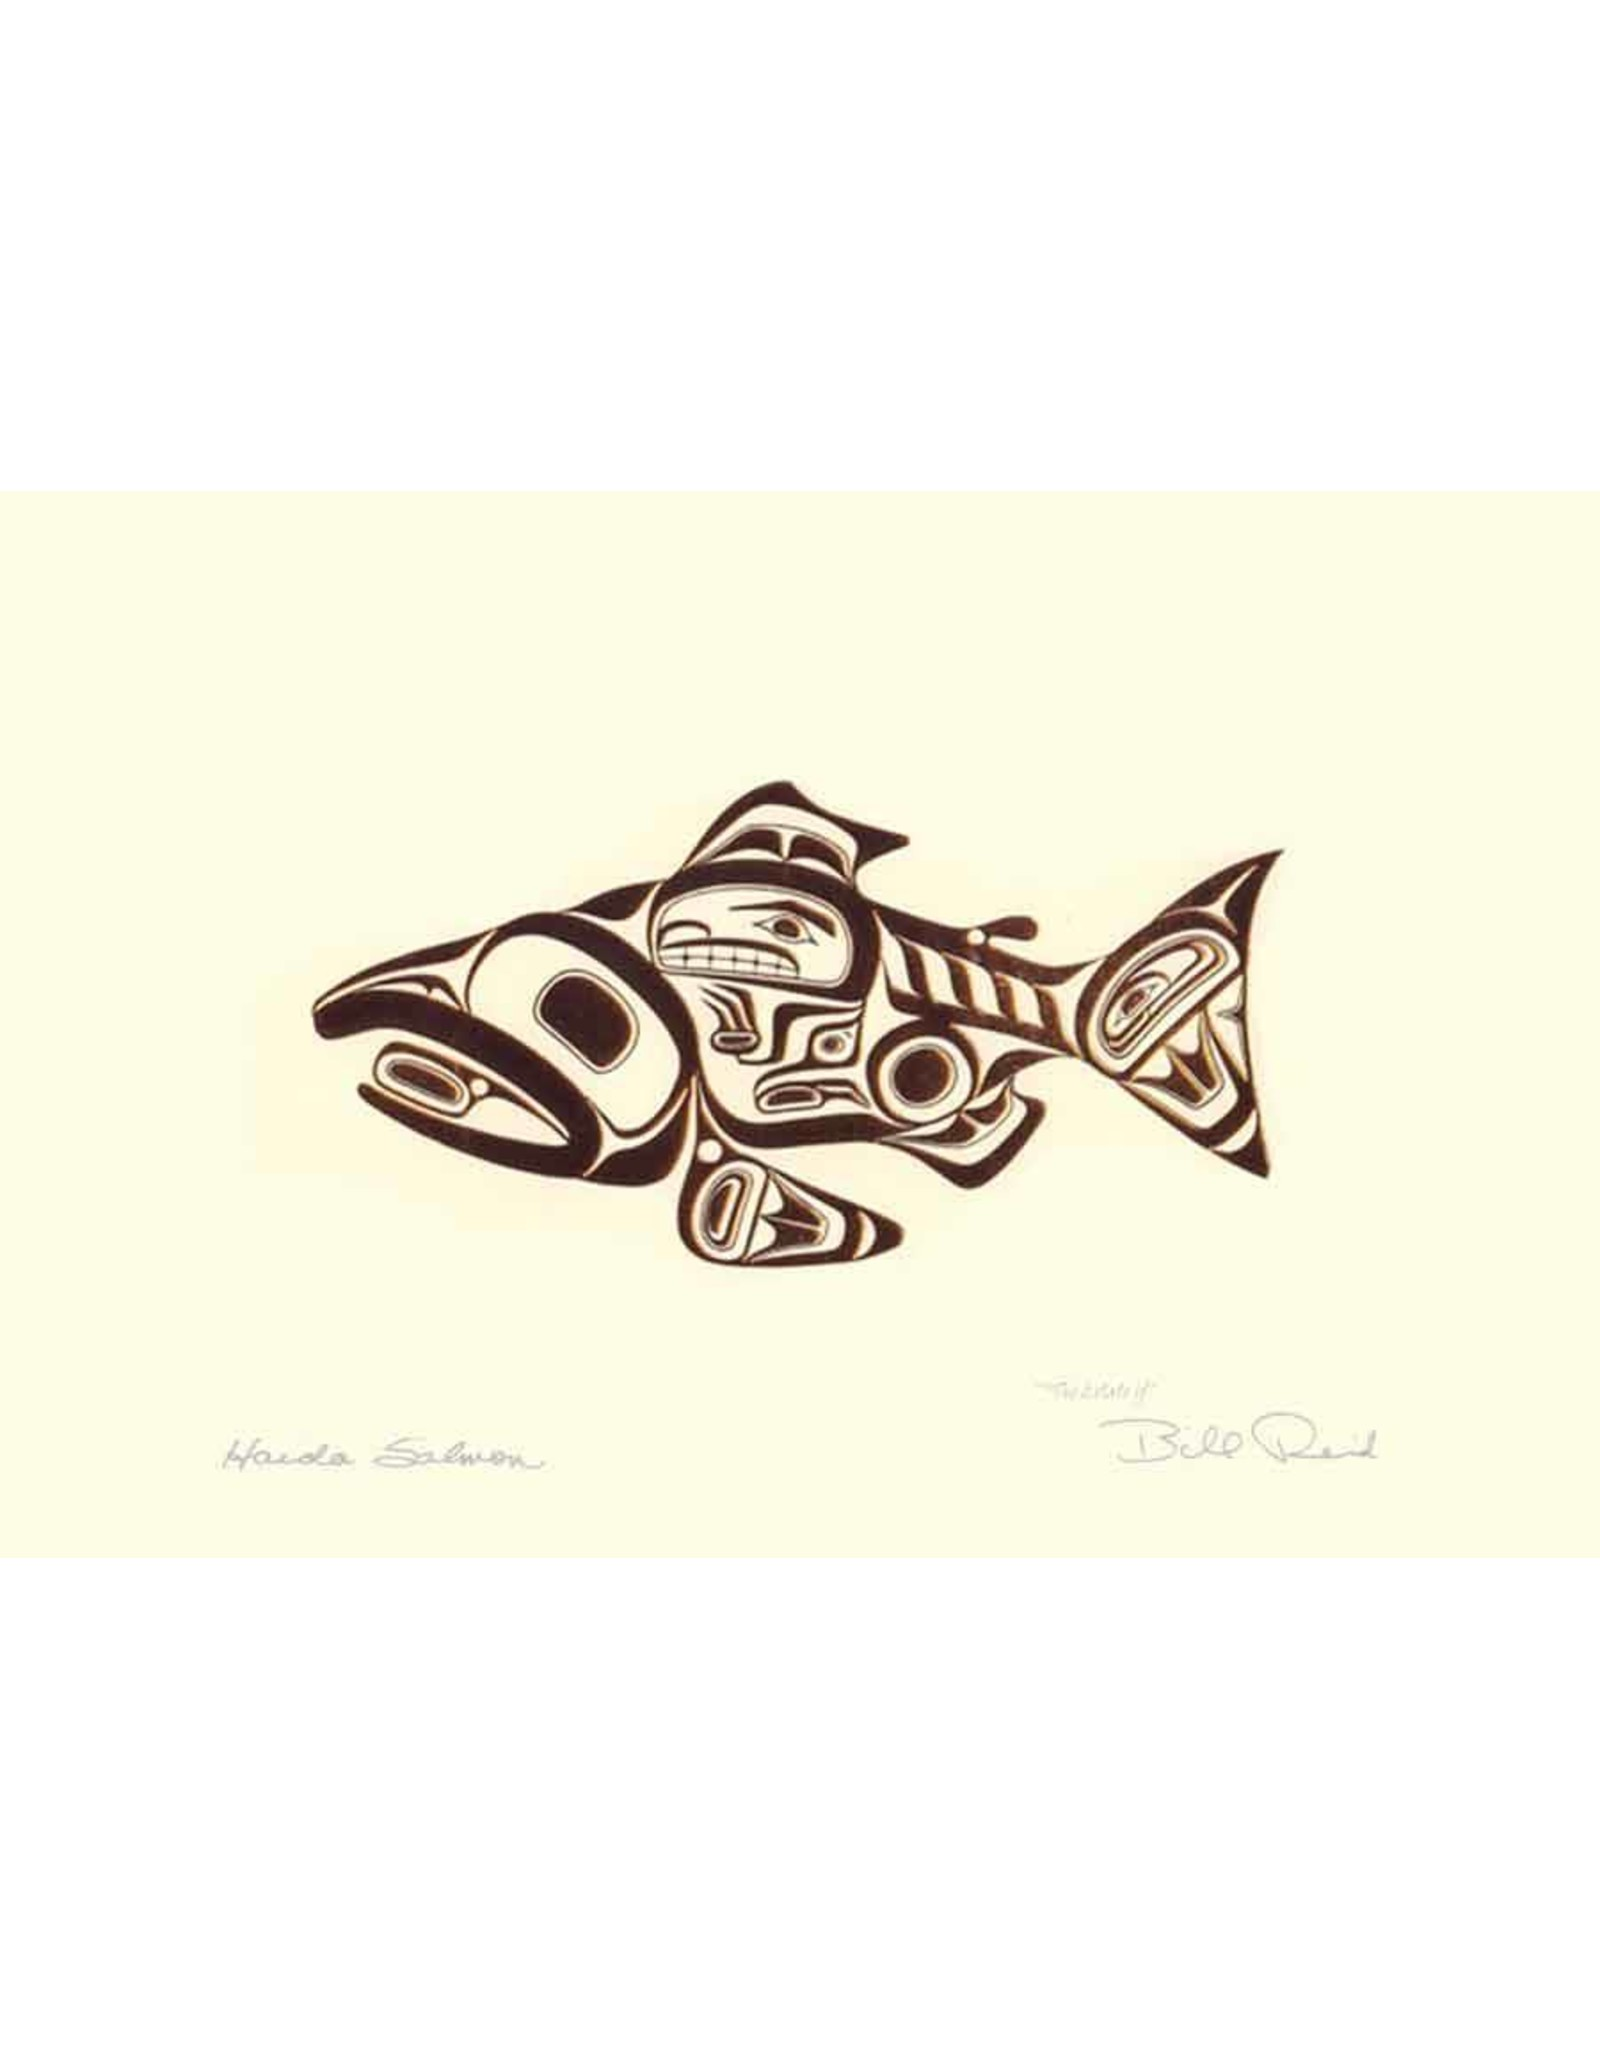 Haida Salmon - SKAAGI by Bill Reid Card 7440